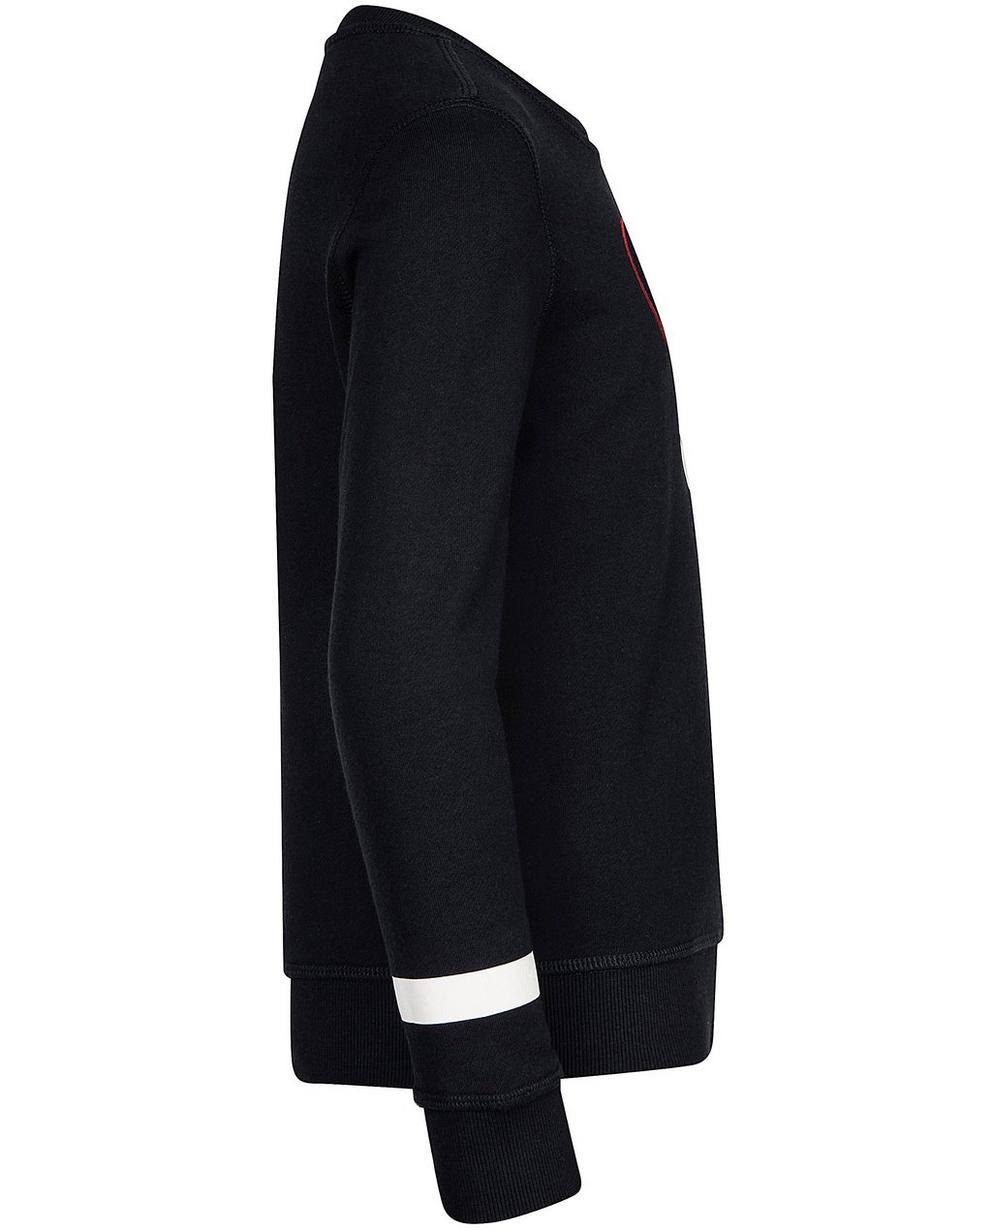 Sweater - Navy - Sweater mit Reliefprint